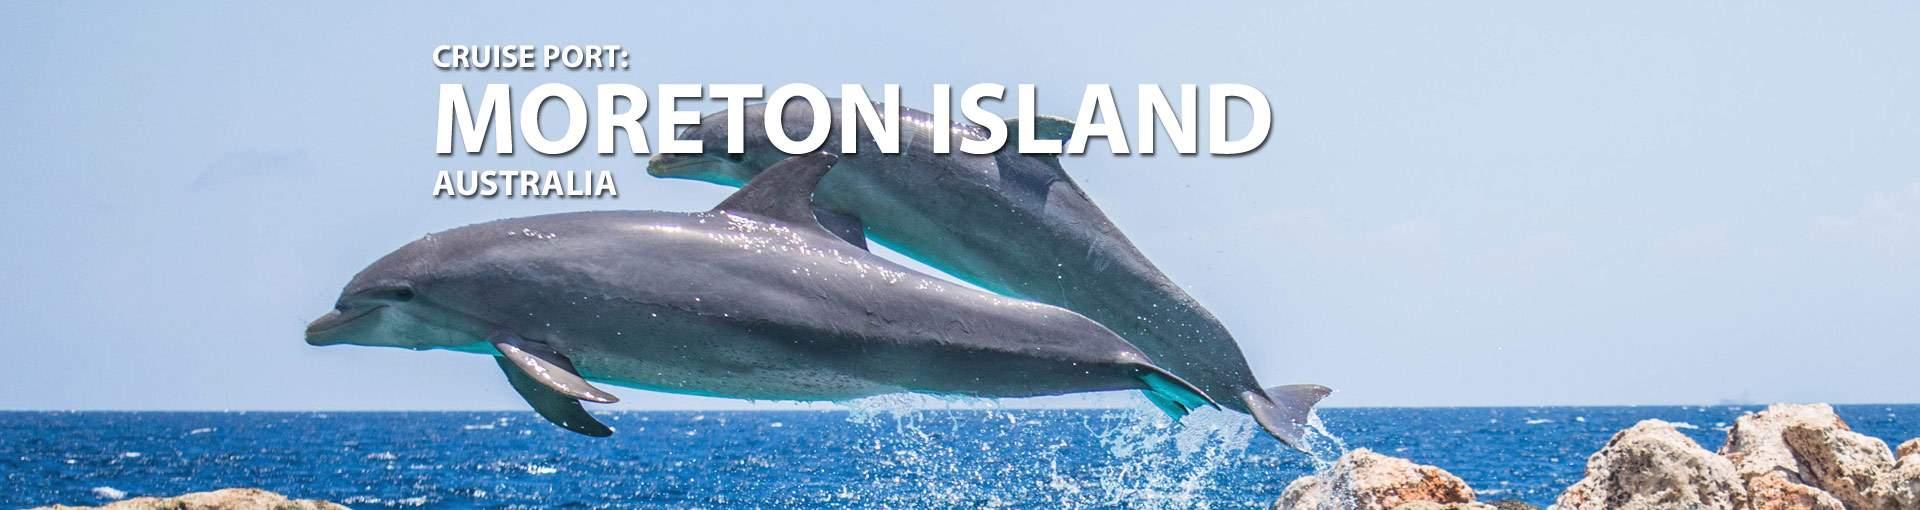 Moreton Island, Australia Cruise Port